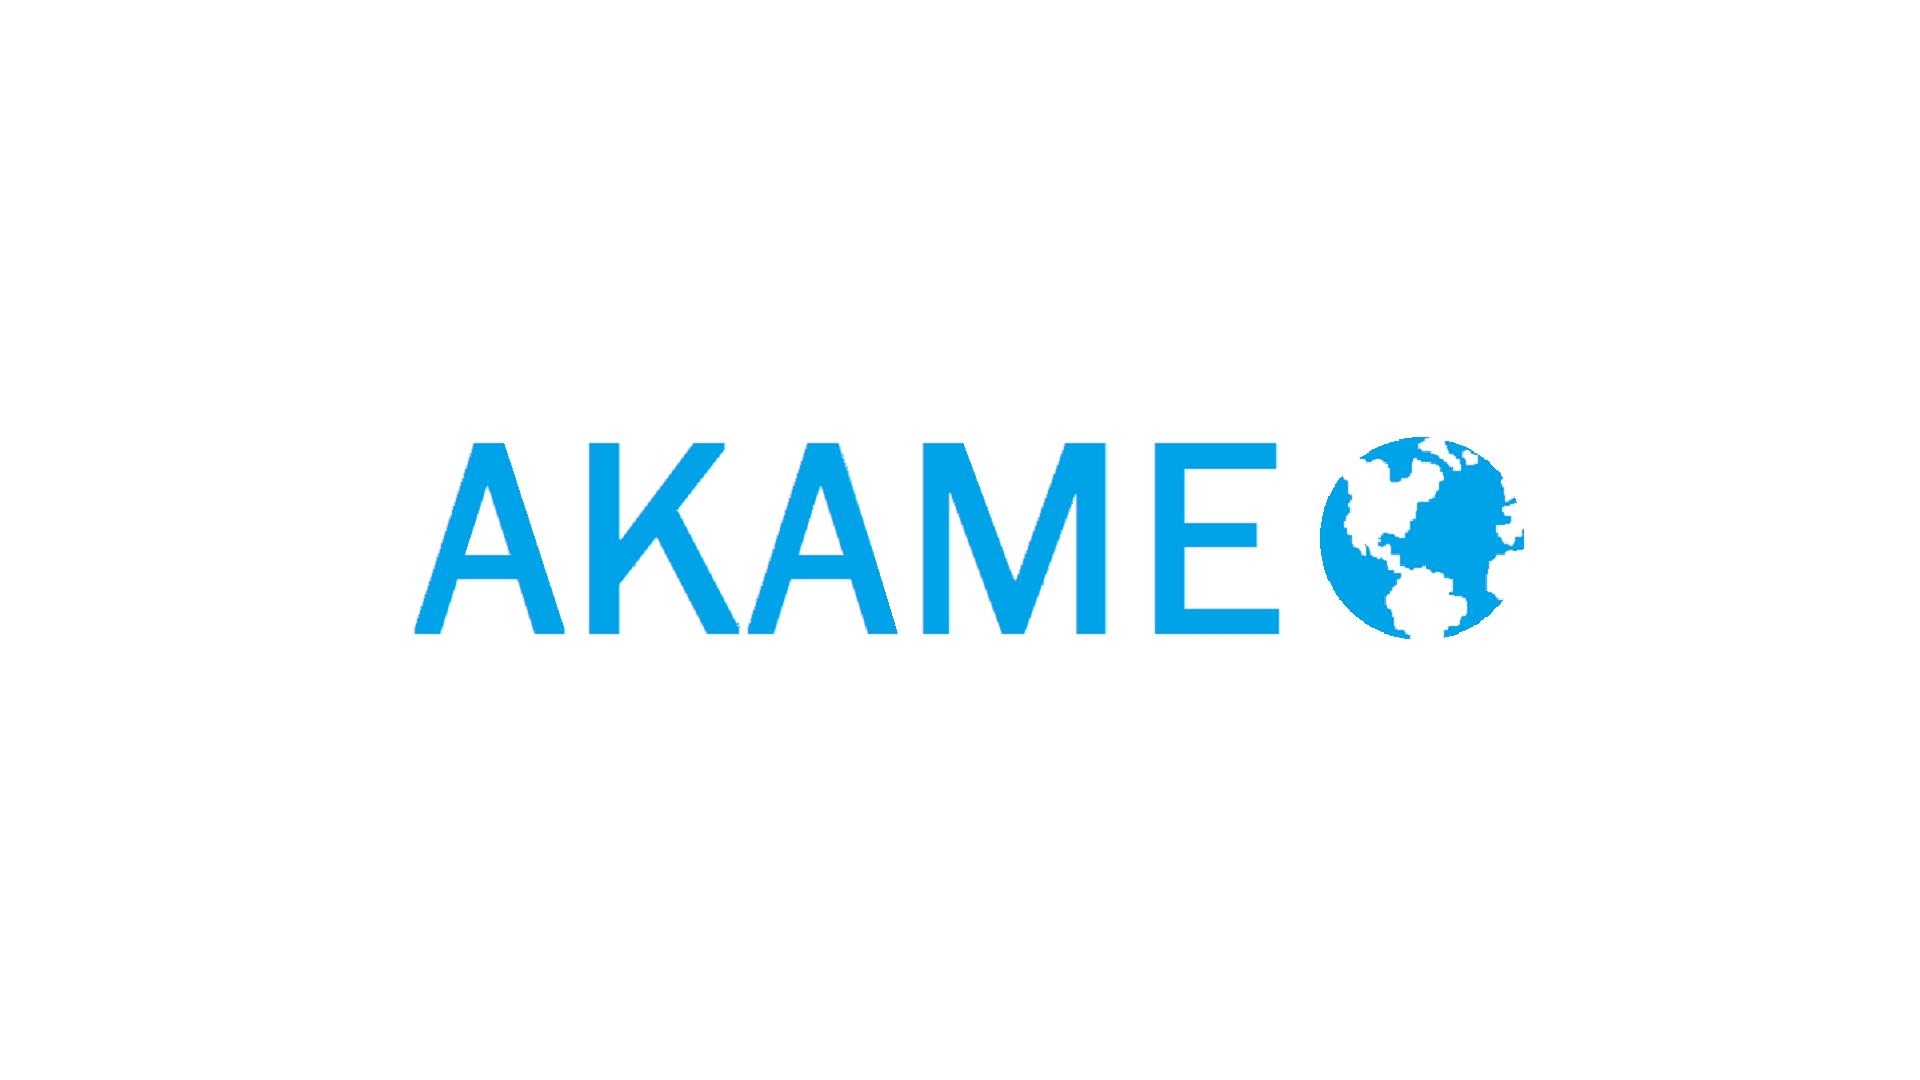 Akaname System